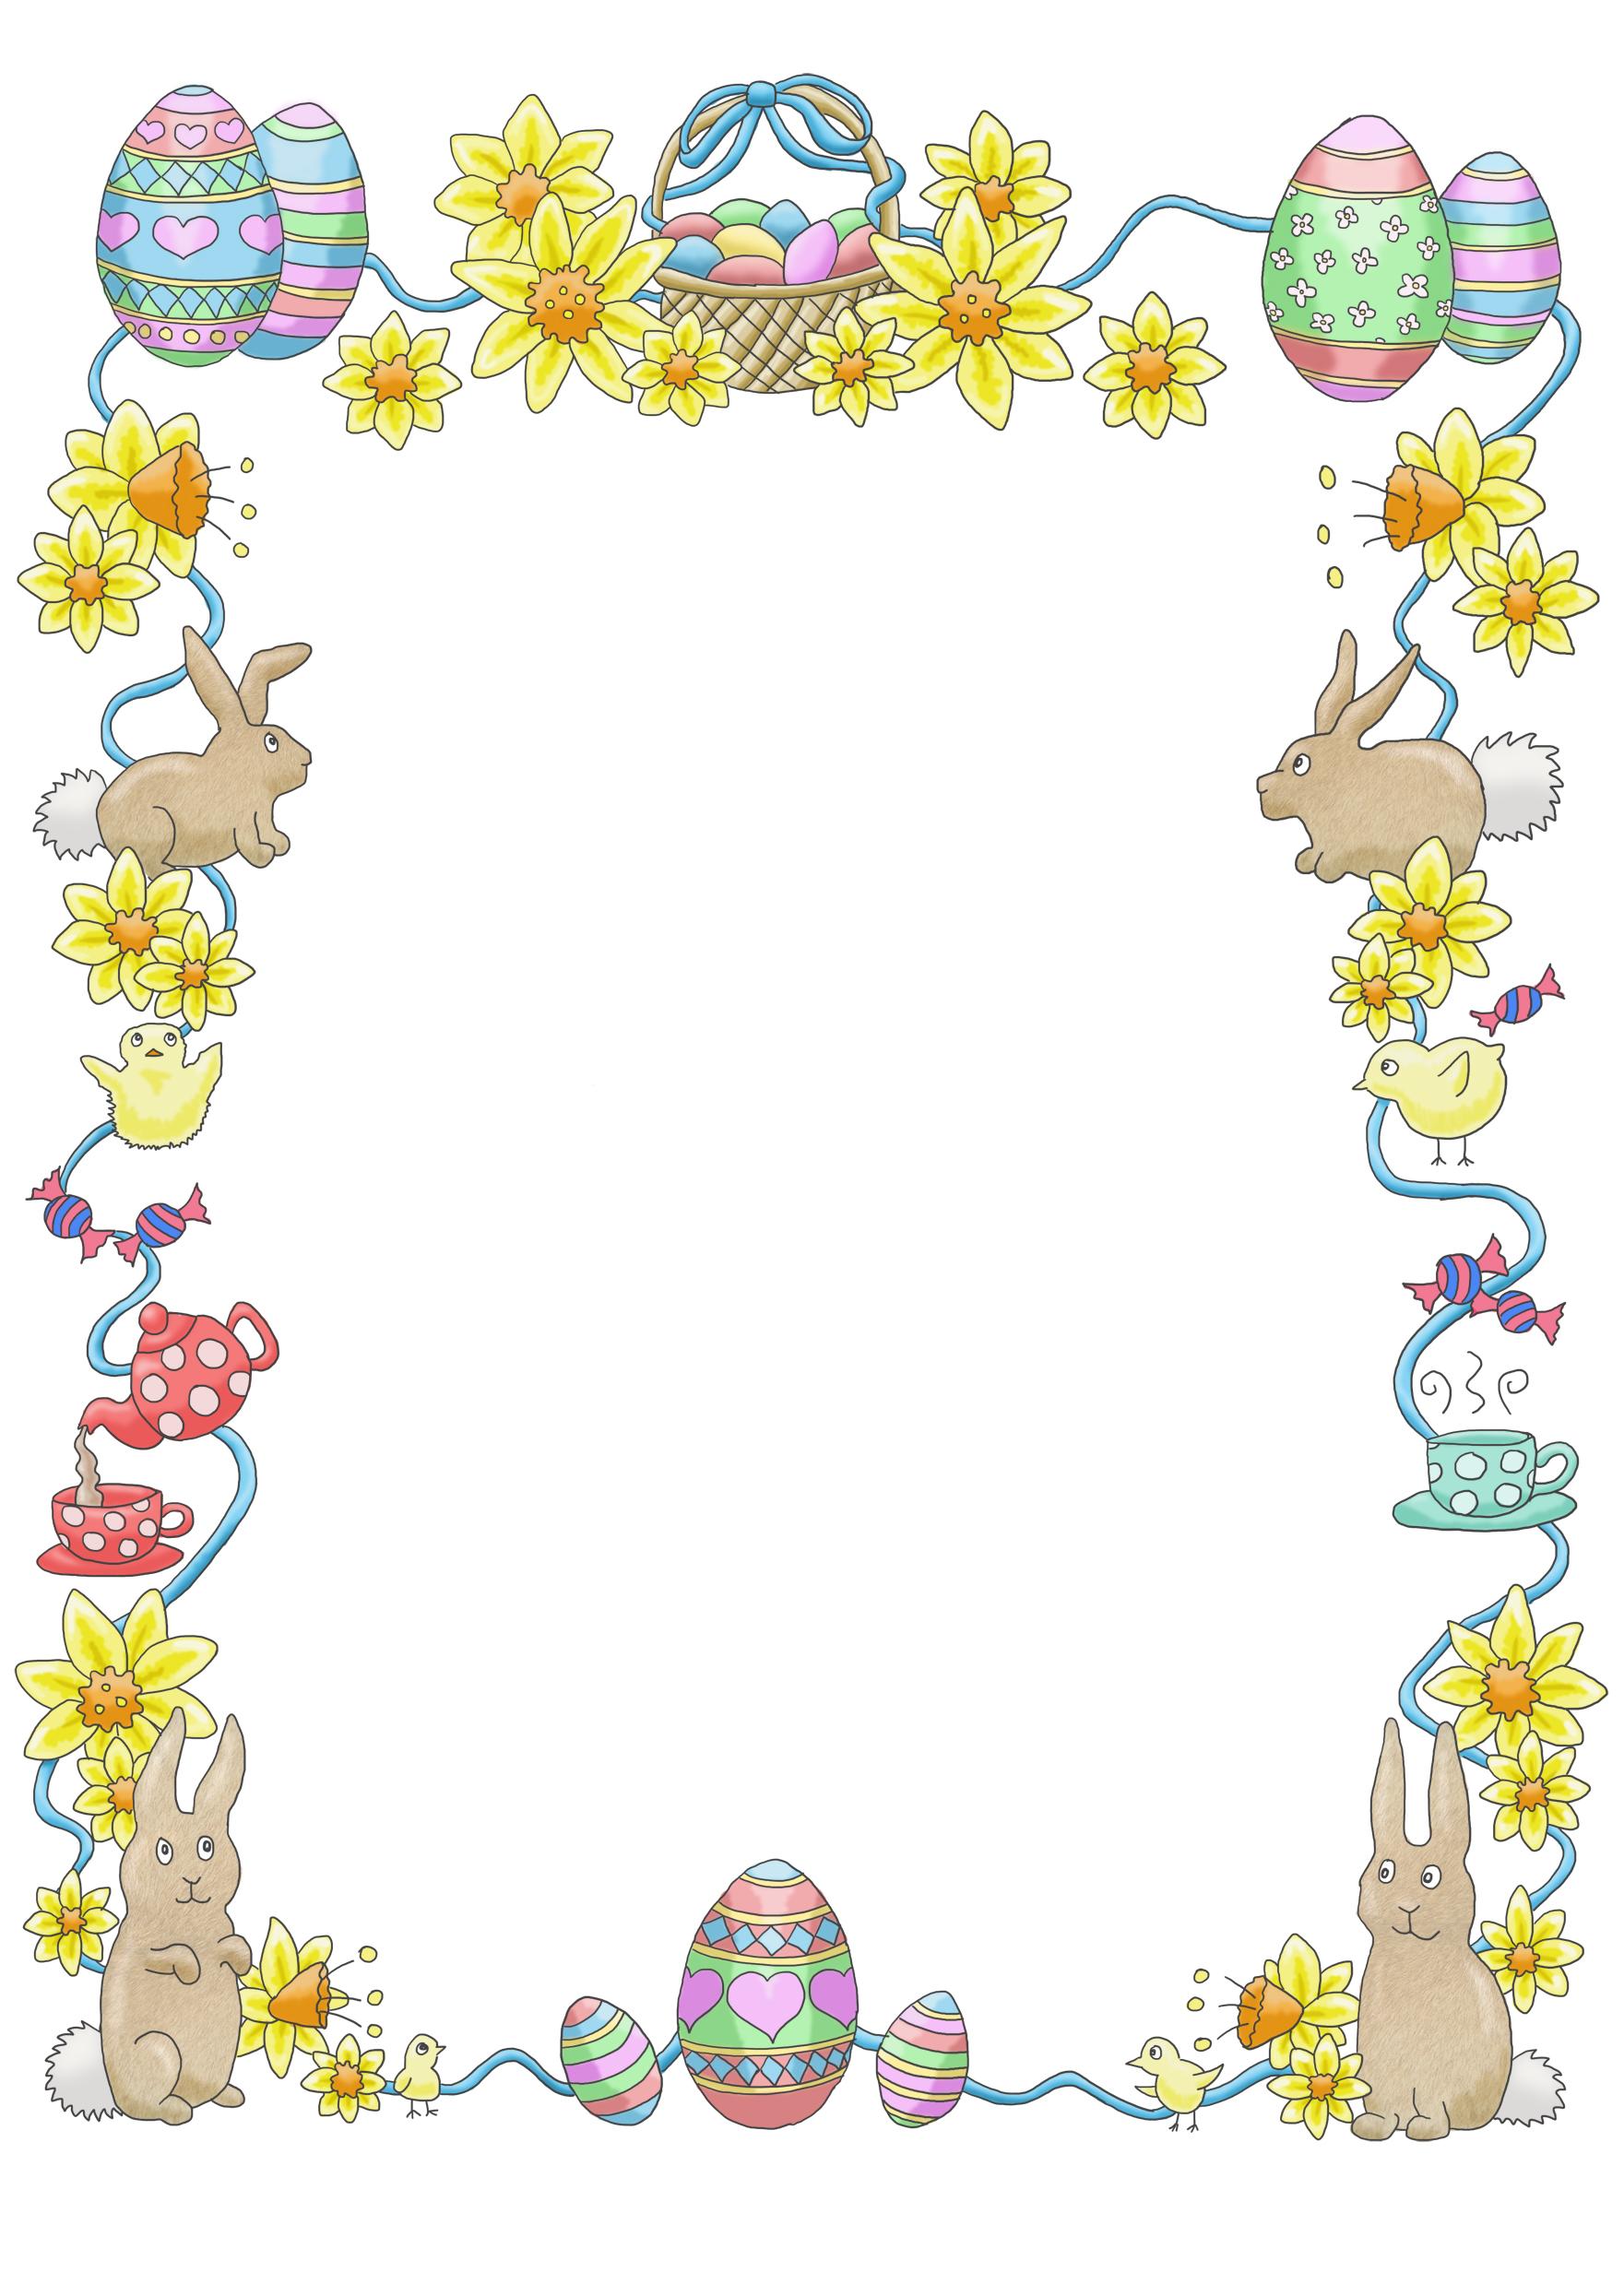 Easter clipart frames clip art freeuse download Free Easter Clipart Frames | oceanfur23.com clip art freeuse download